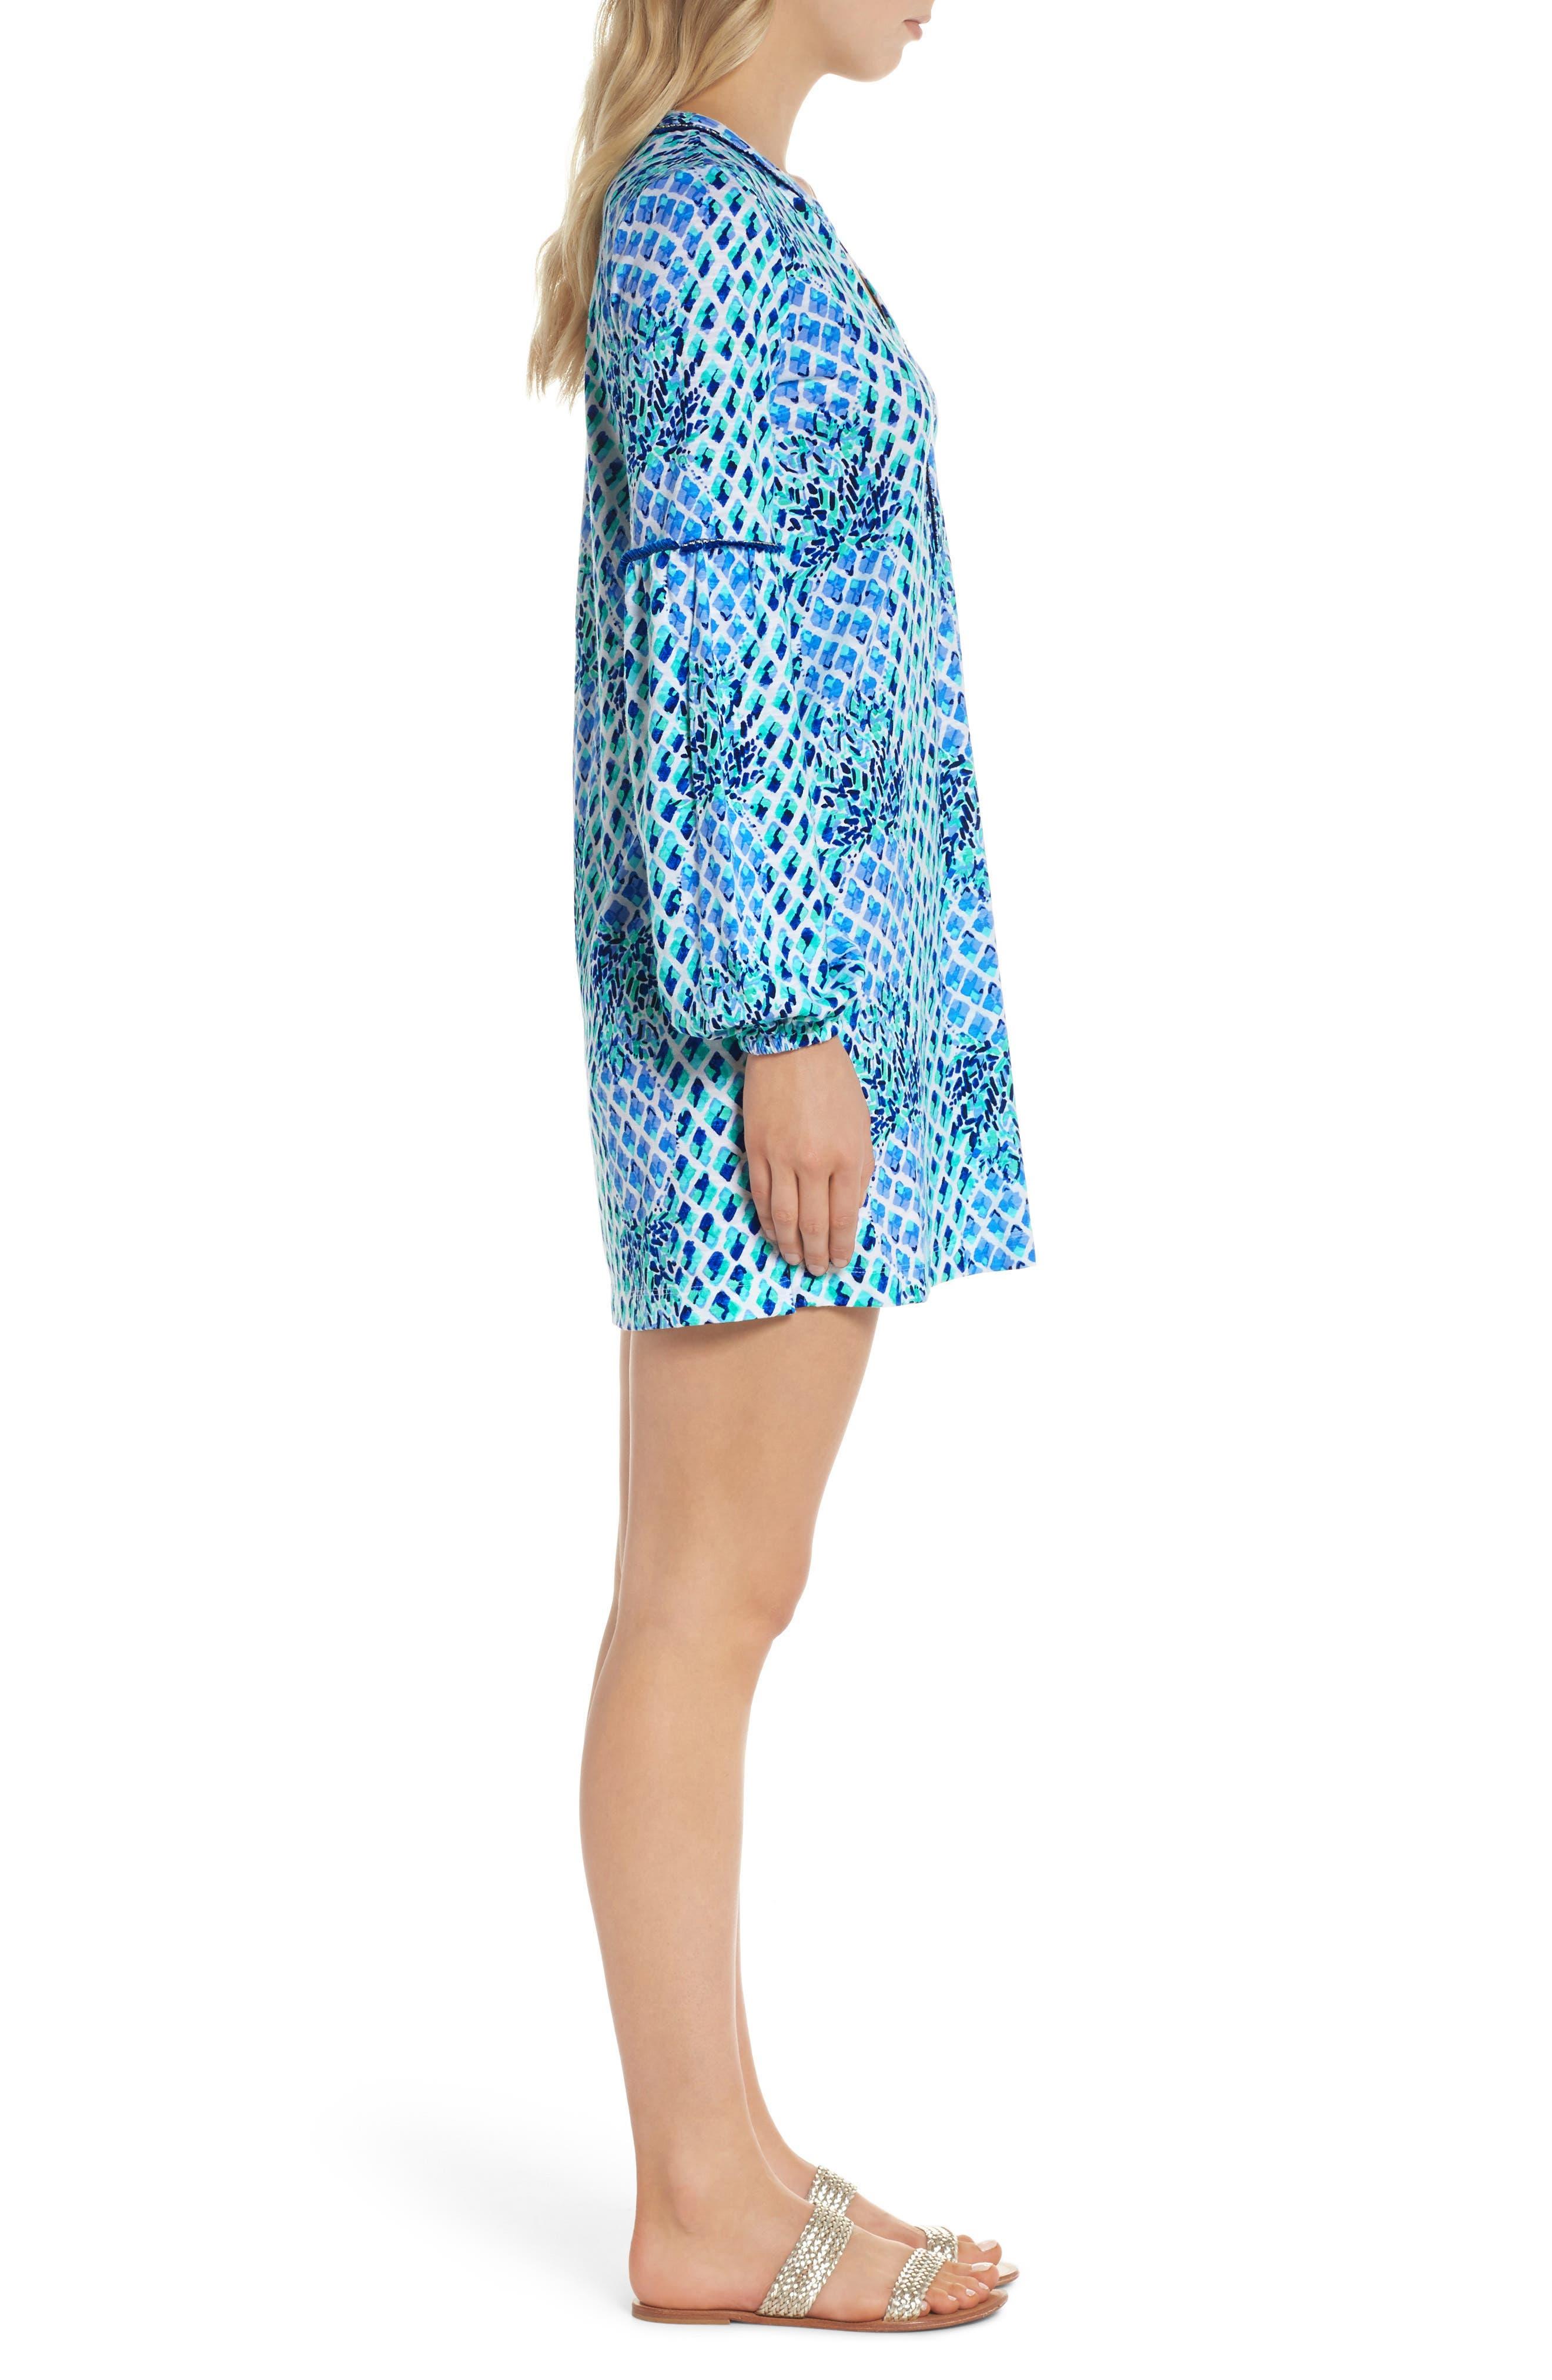 Joy Tunic Dress,                             Alternate thumbnail 3, color,                             Resort White Toe In